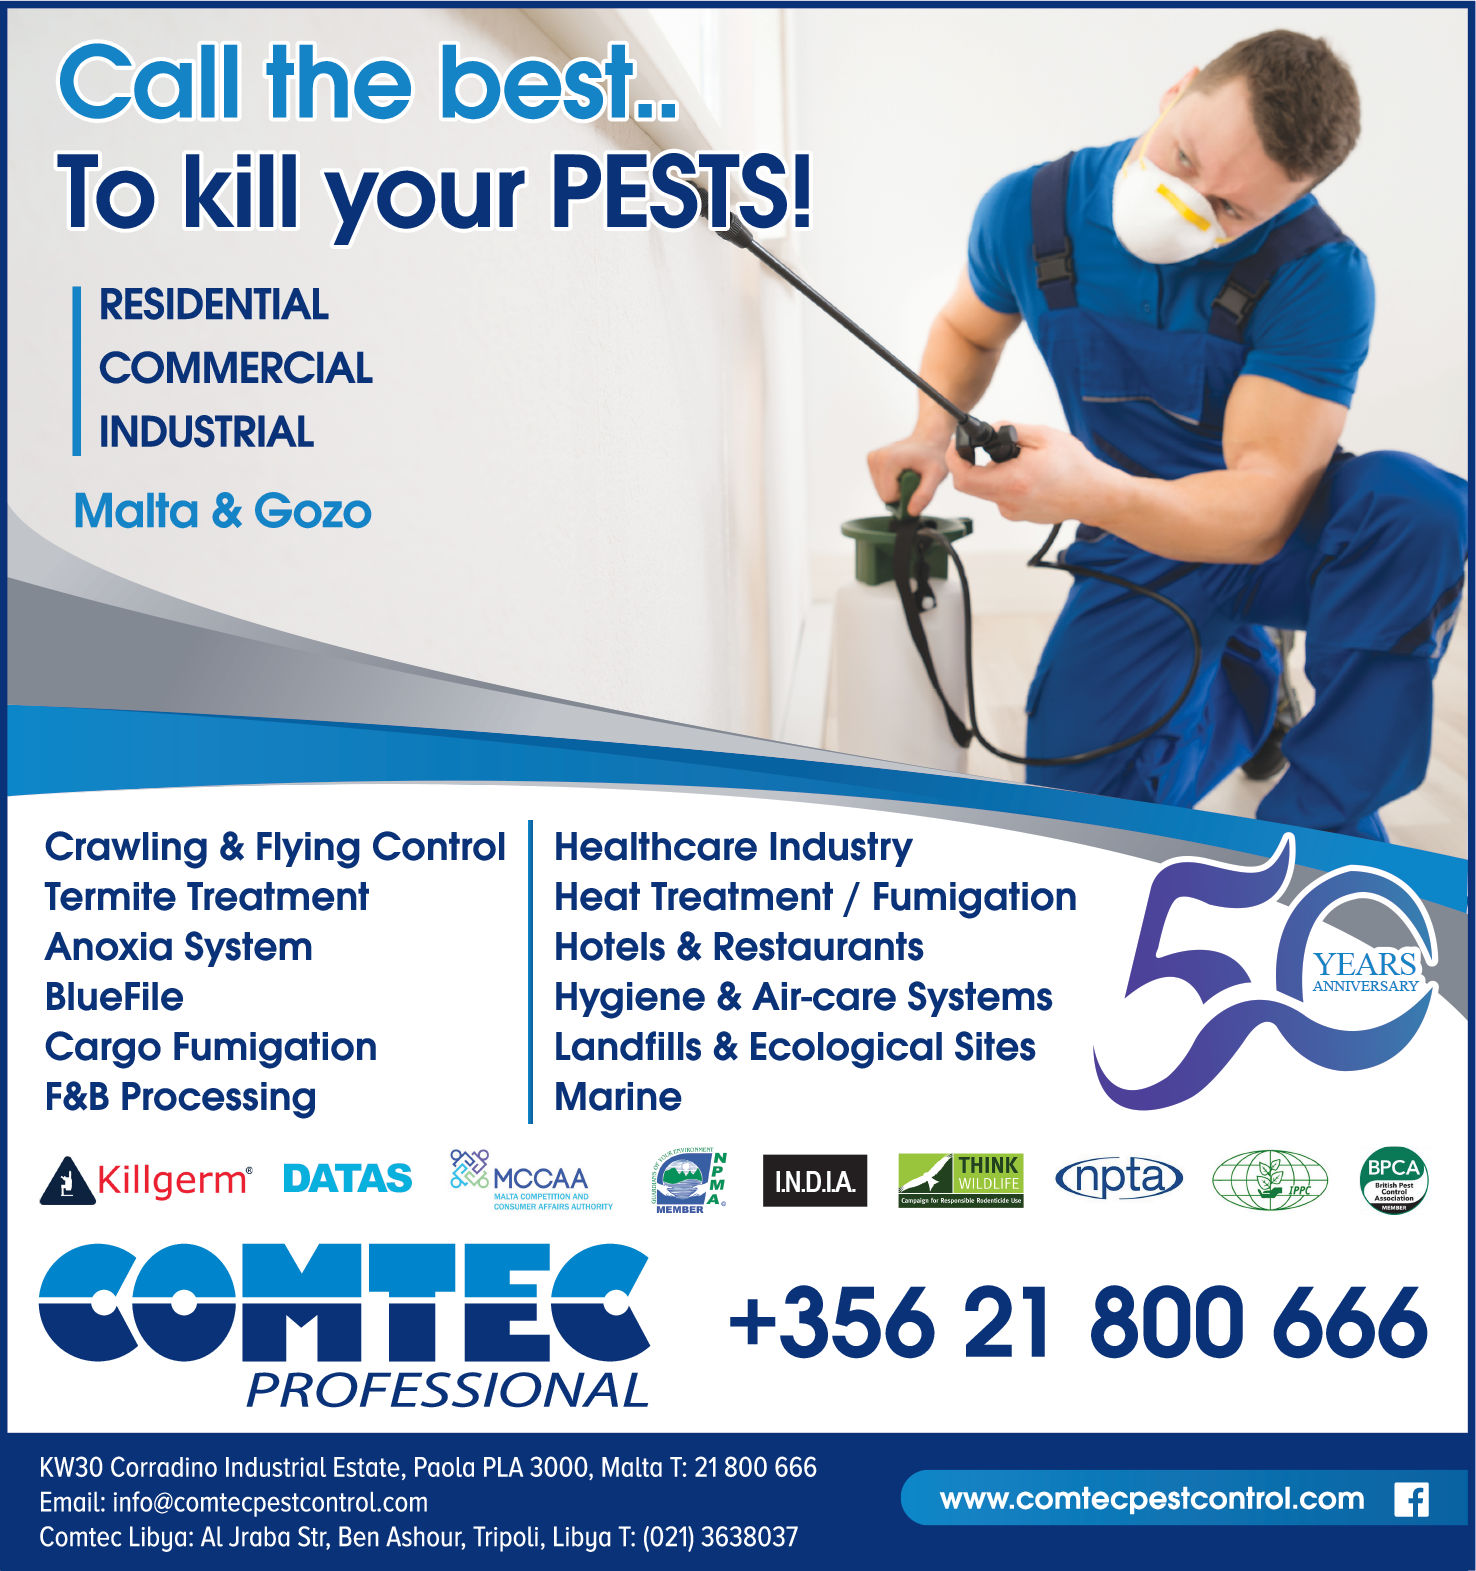 Comtec Service Ltd - Pest Control Services in Paola, Malta